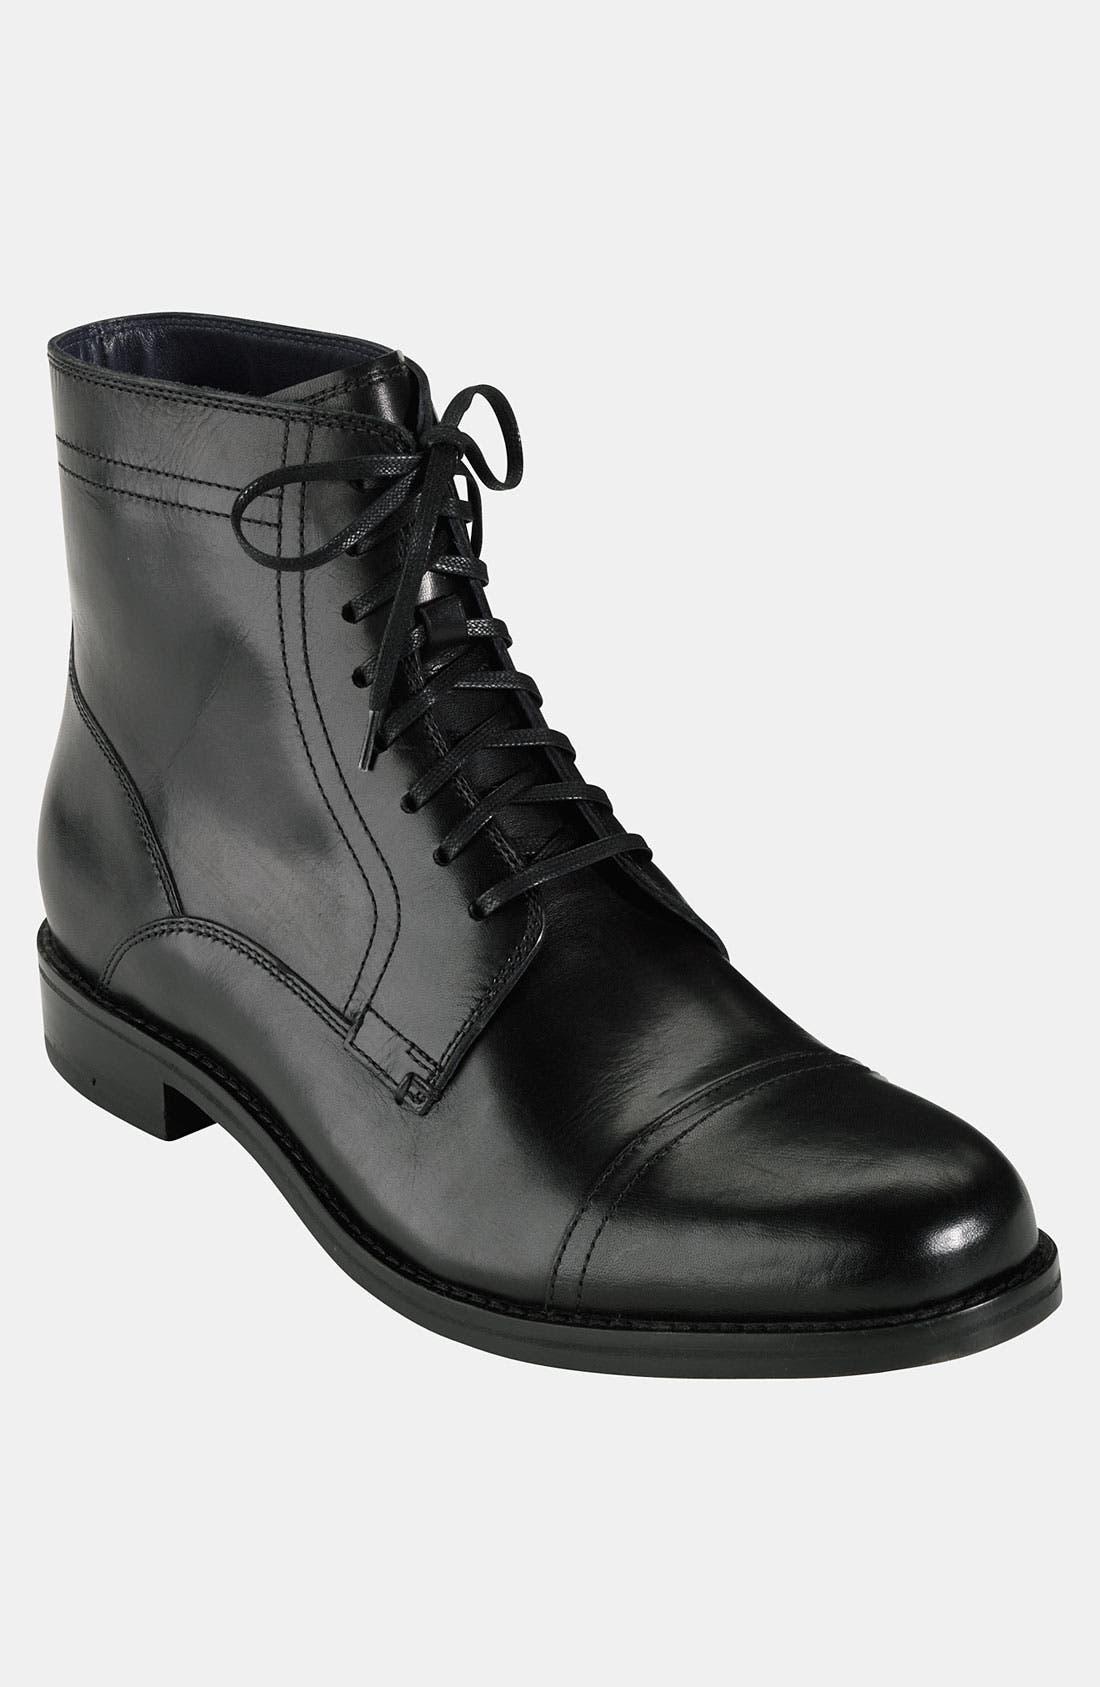 Alternate Image 1 Selected - Cole Haan 'Harrison' Cap Toe Boot